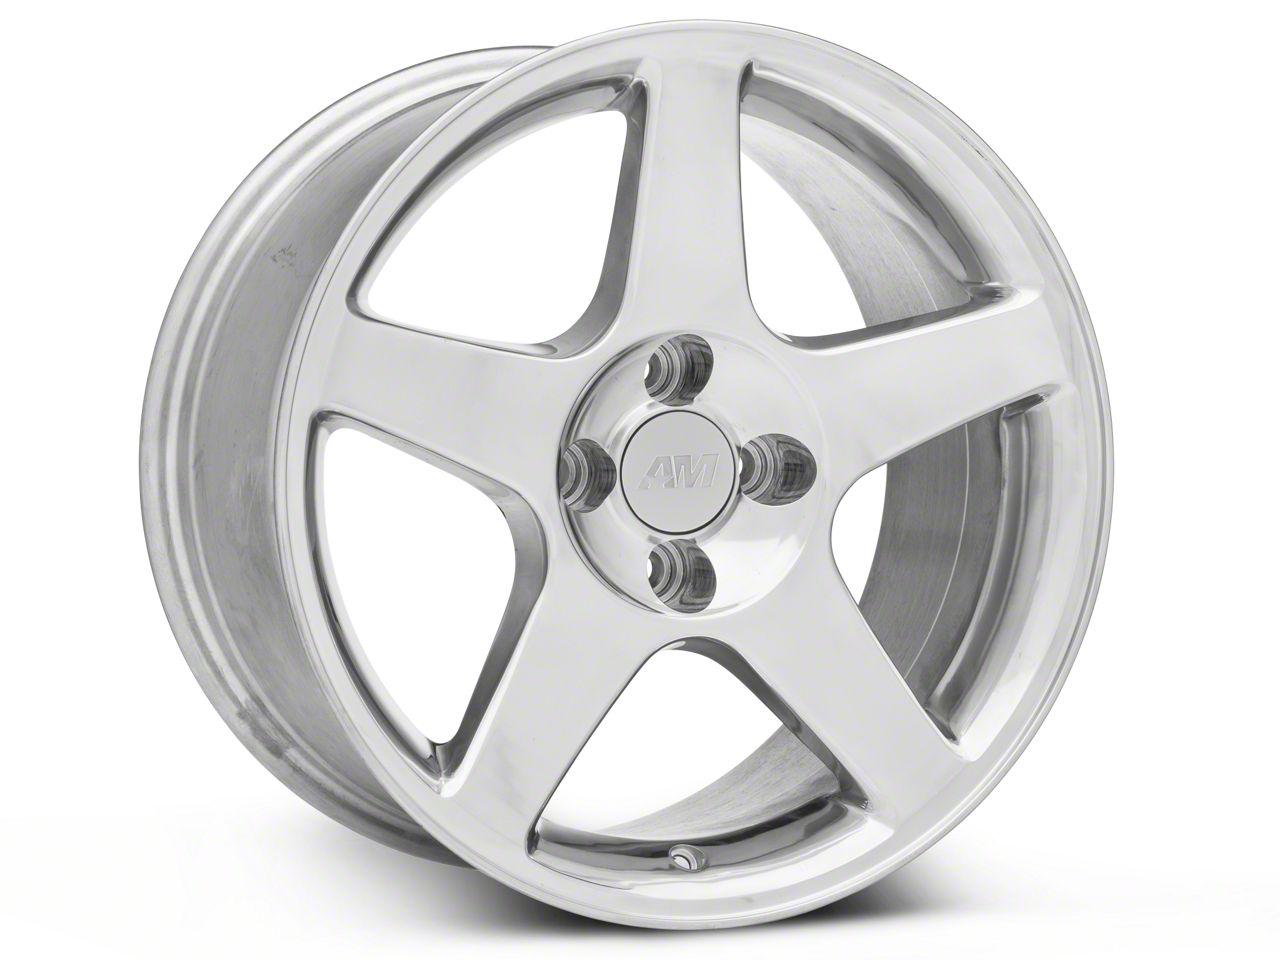 2003 Cobra Style Polished Wheel - 17x9 (87-93 All, Excluding Cobra)